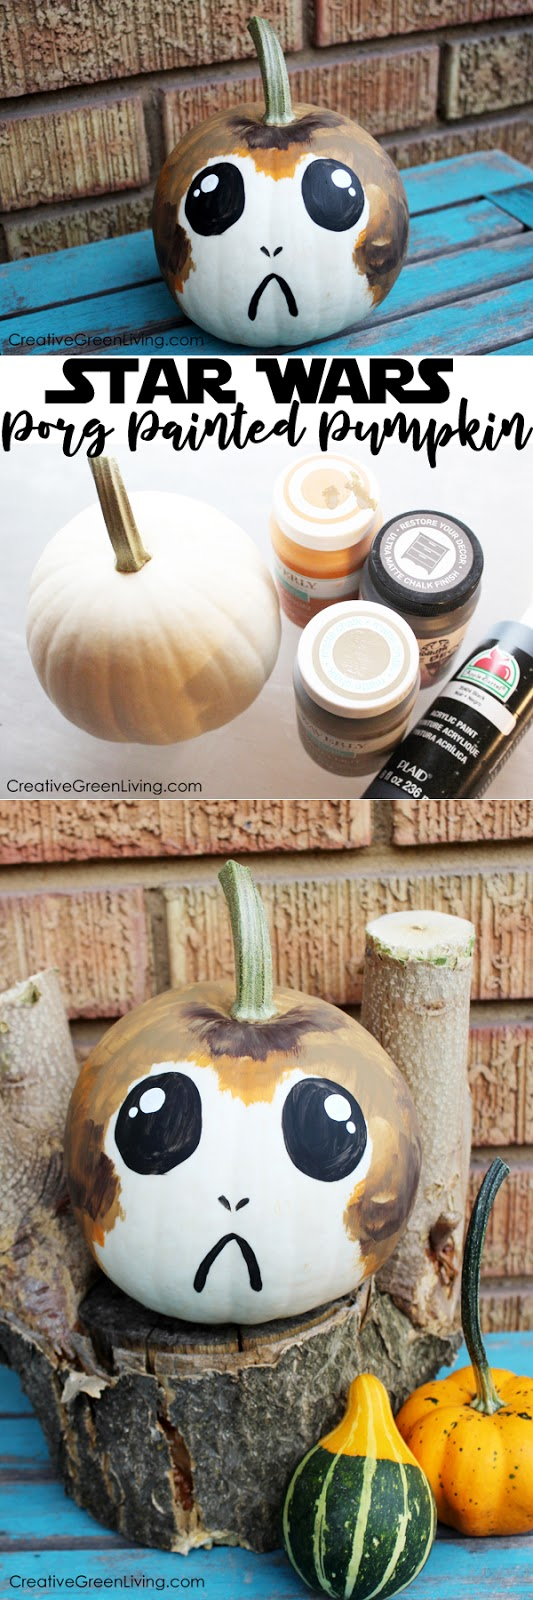 star wars halloween craft porg pumpkins creative green living. Black Bedroom Furniture Sets. Home Design Ideas